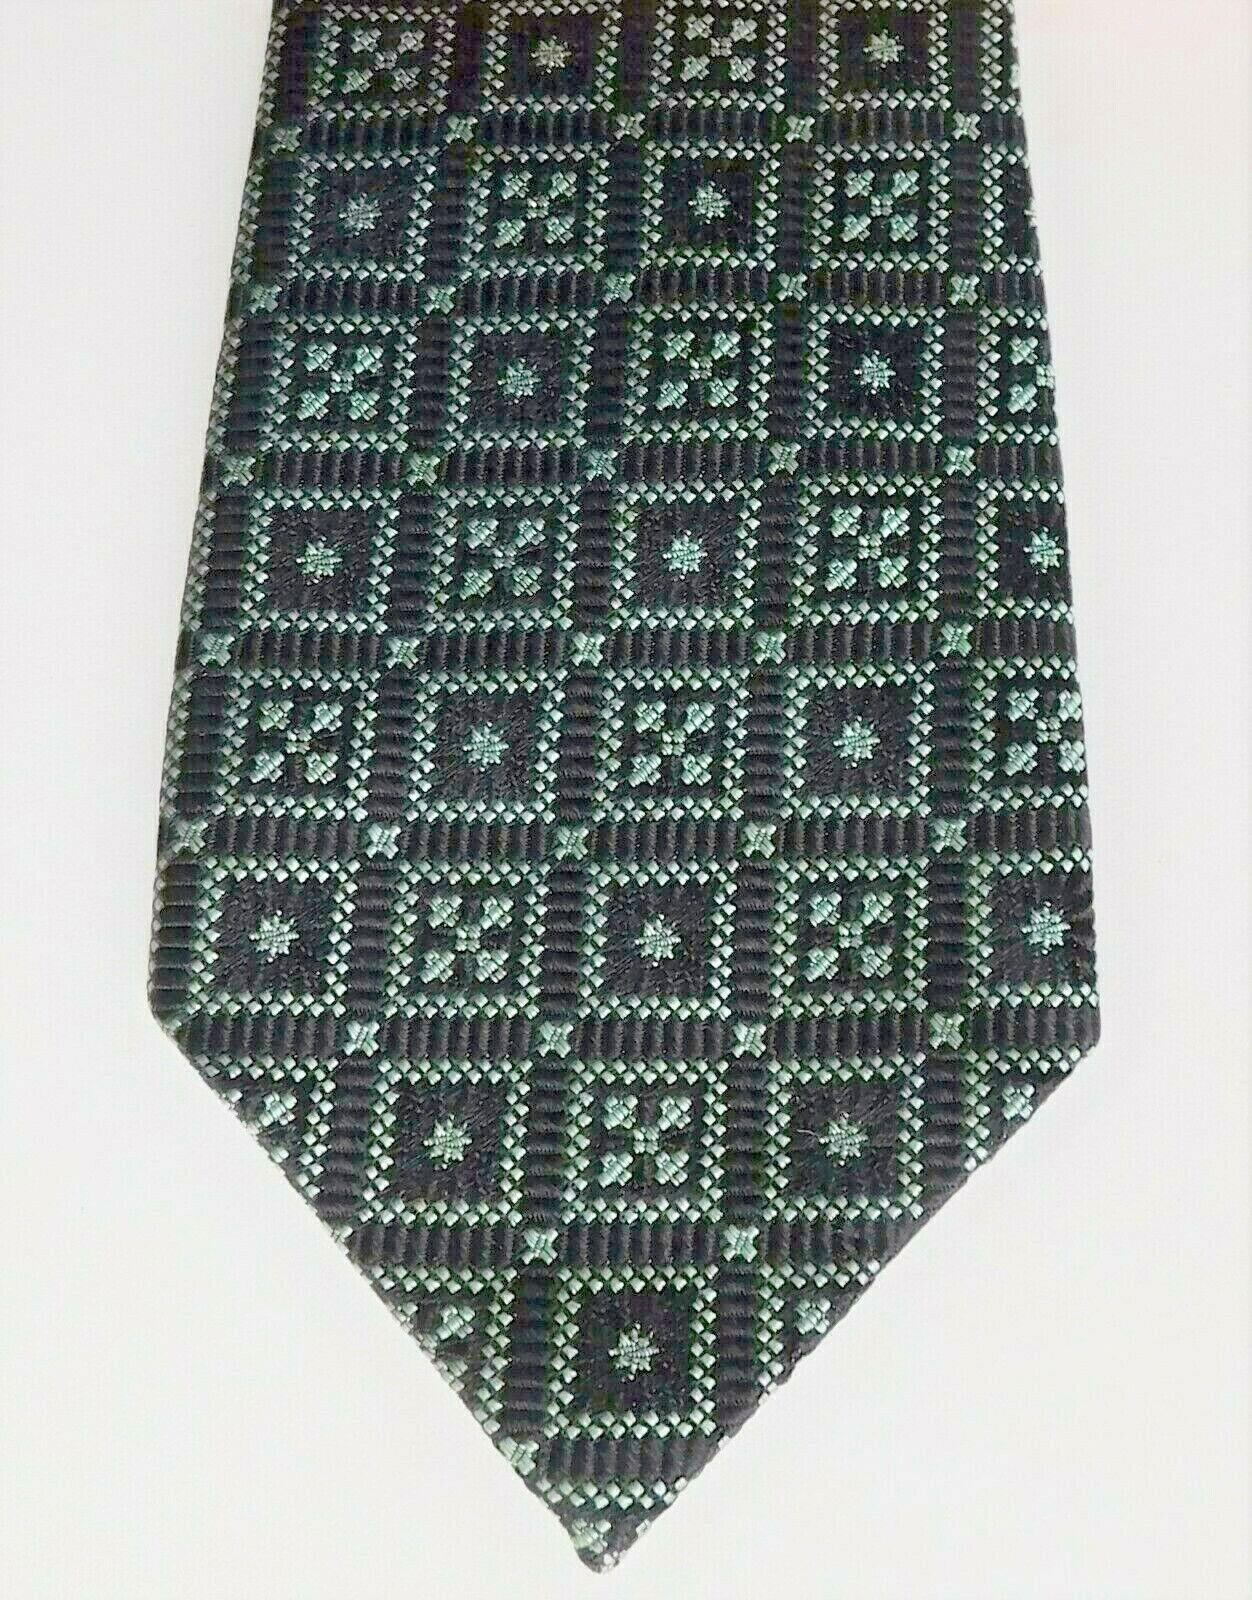 Hodgkinson Jermyn Street tie from English silk squares vintage 1960s black green